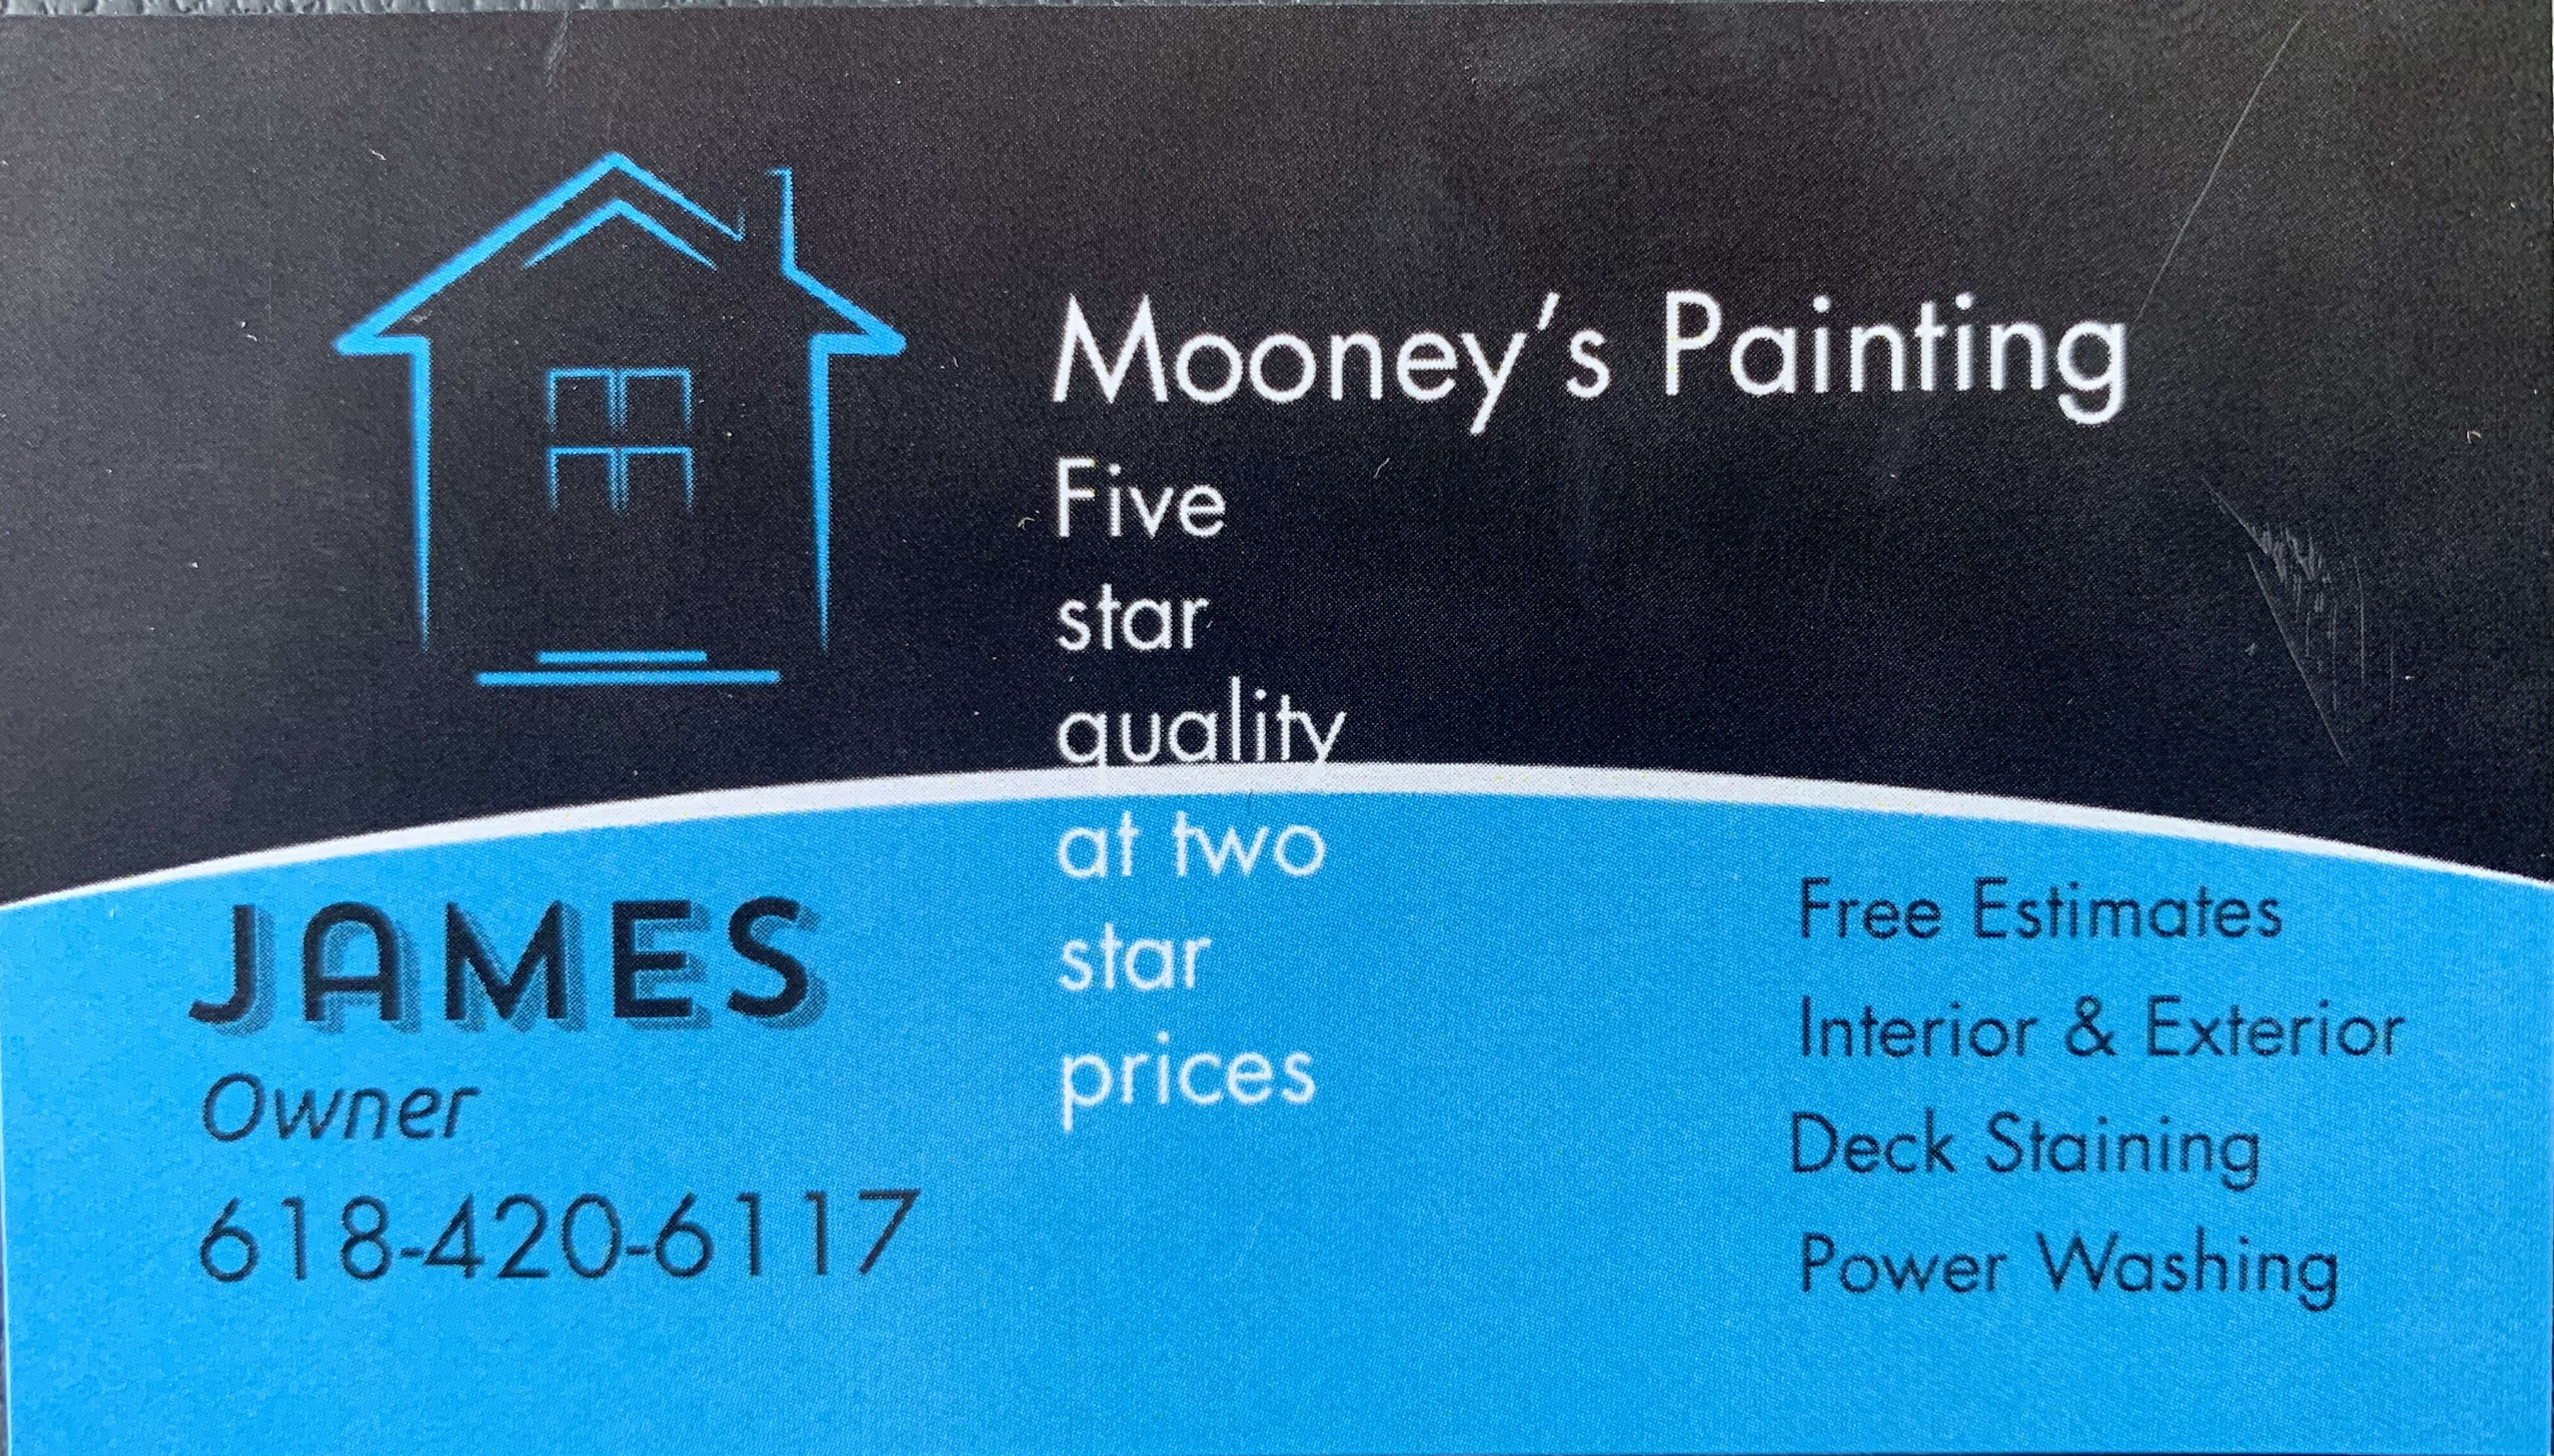 Mooney's Painting Co